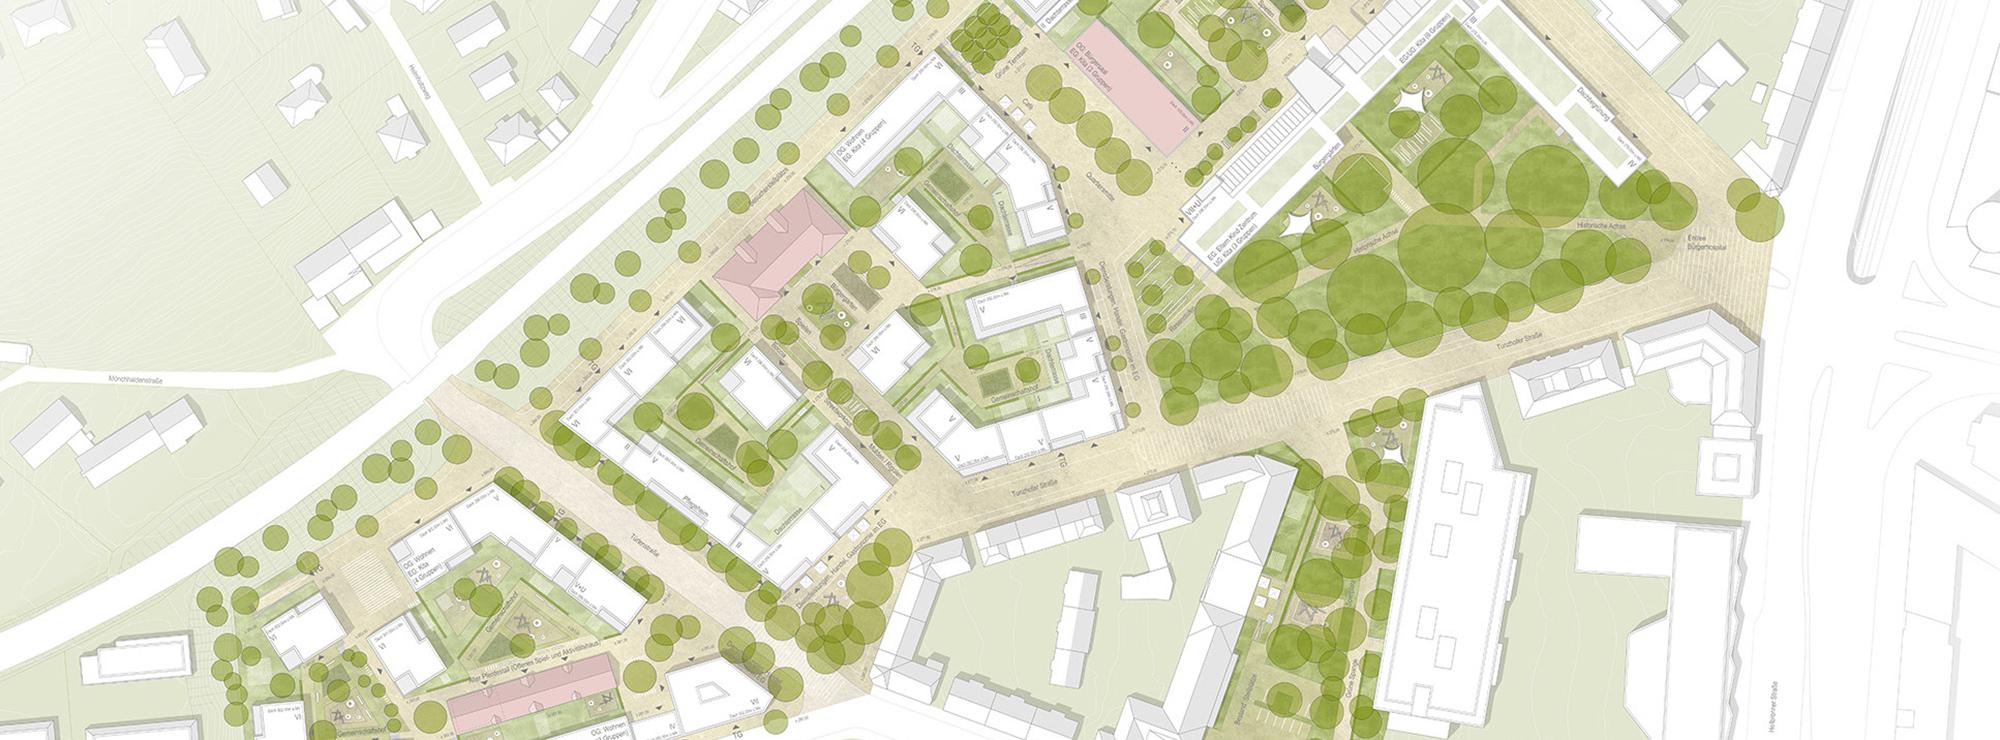 Stuttgart Bürgerhospital Lageplan